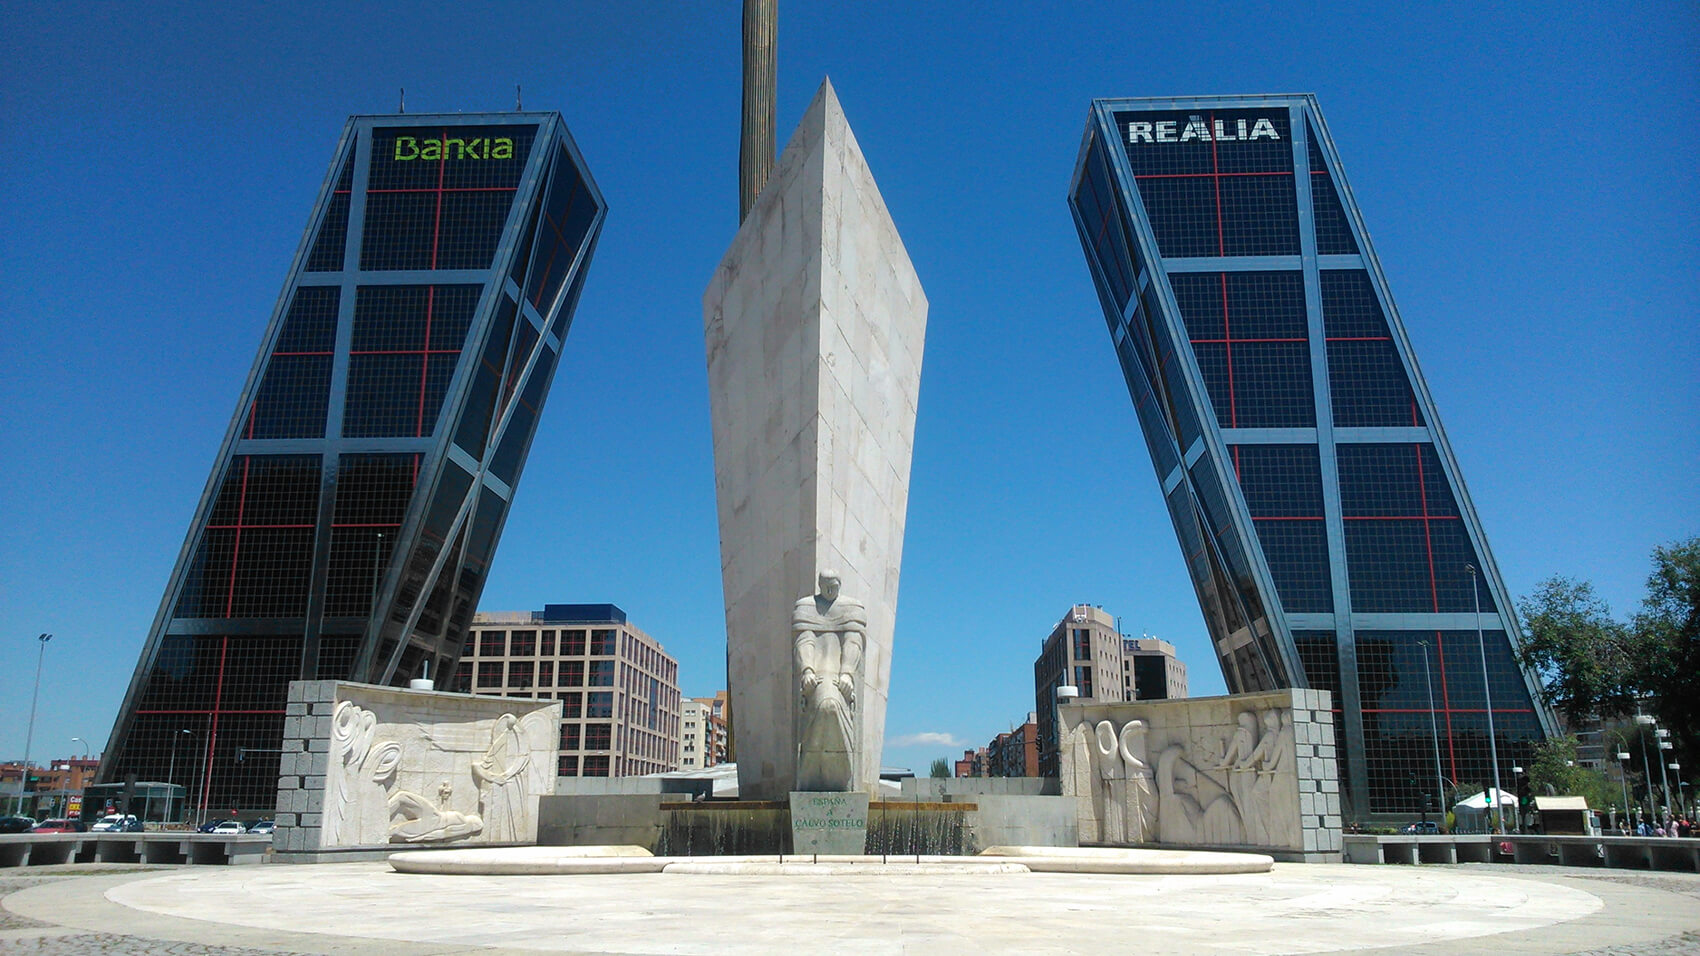 Bankia hq torres kio madrid - Torres kio arquitecto ...